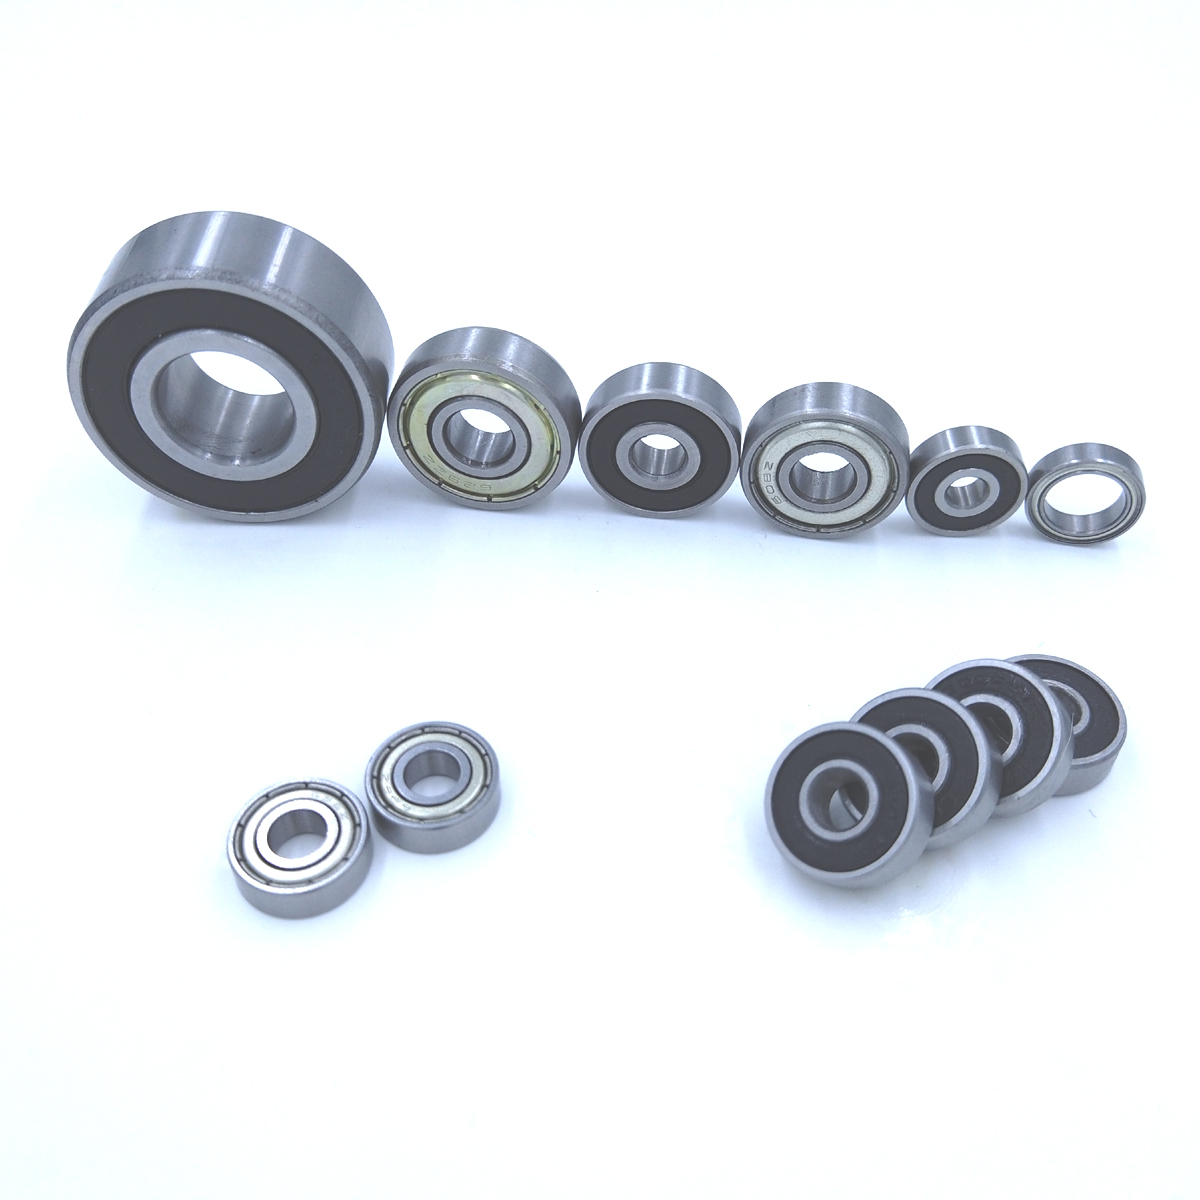 624 624ZZ 624RS 624-2Z 624Z 624-2RS ZZ RS RZ 2RZ Deep Groove Ball Bearings 4 x 13 x 5mm